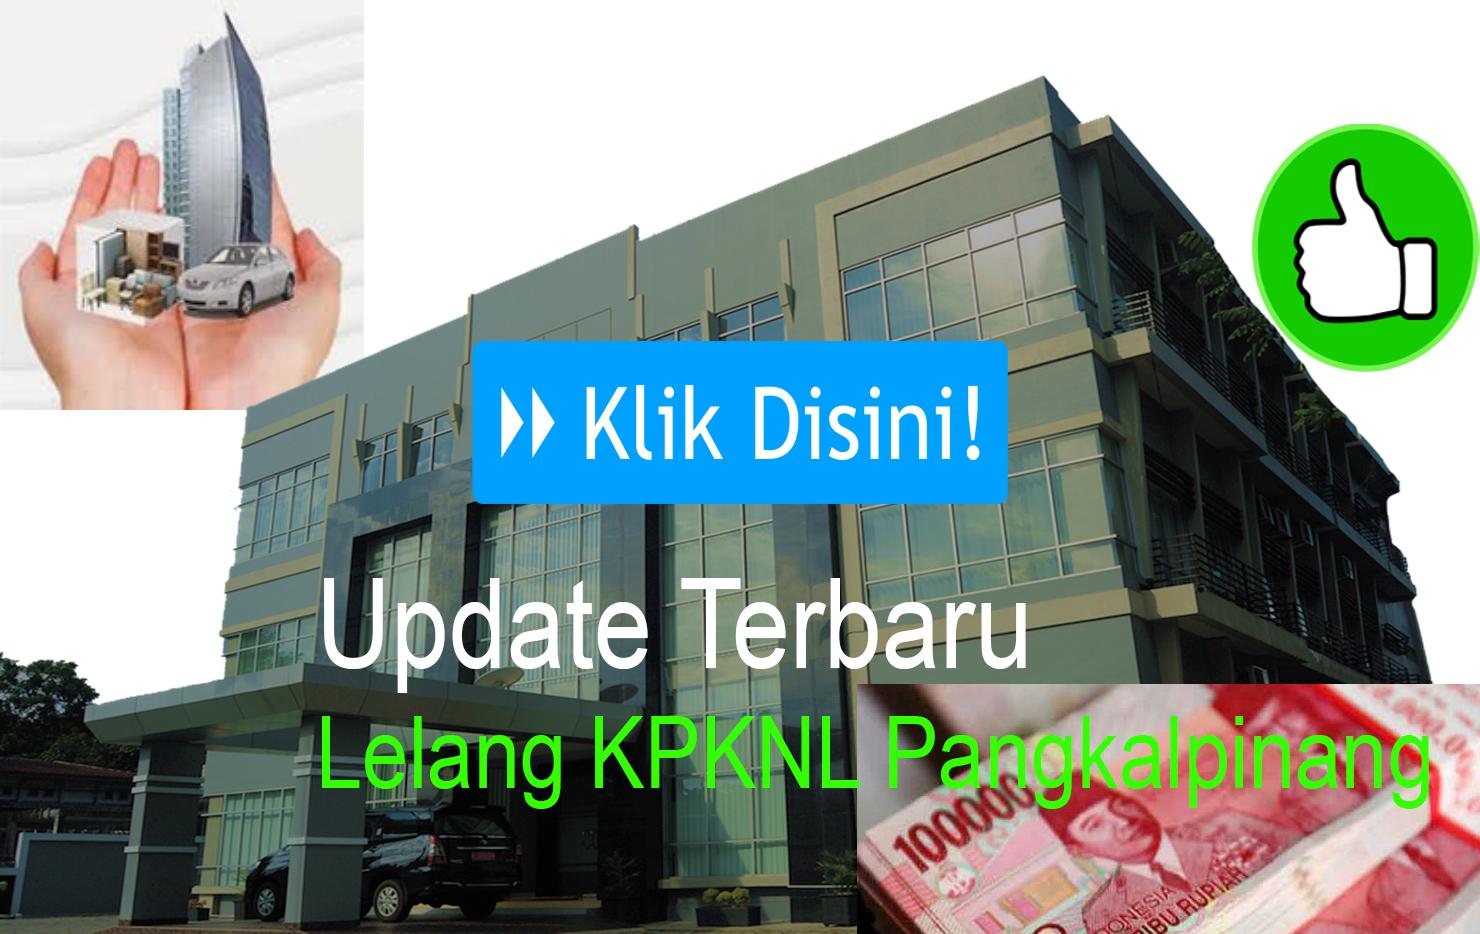 Update Terbaru Lelang KPKNL Pangkalpinang